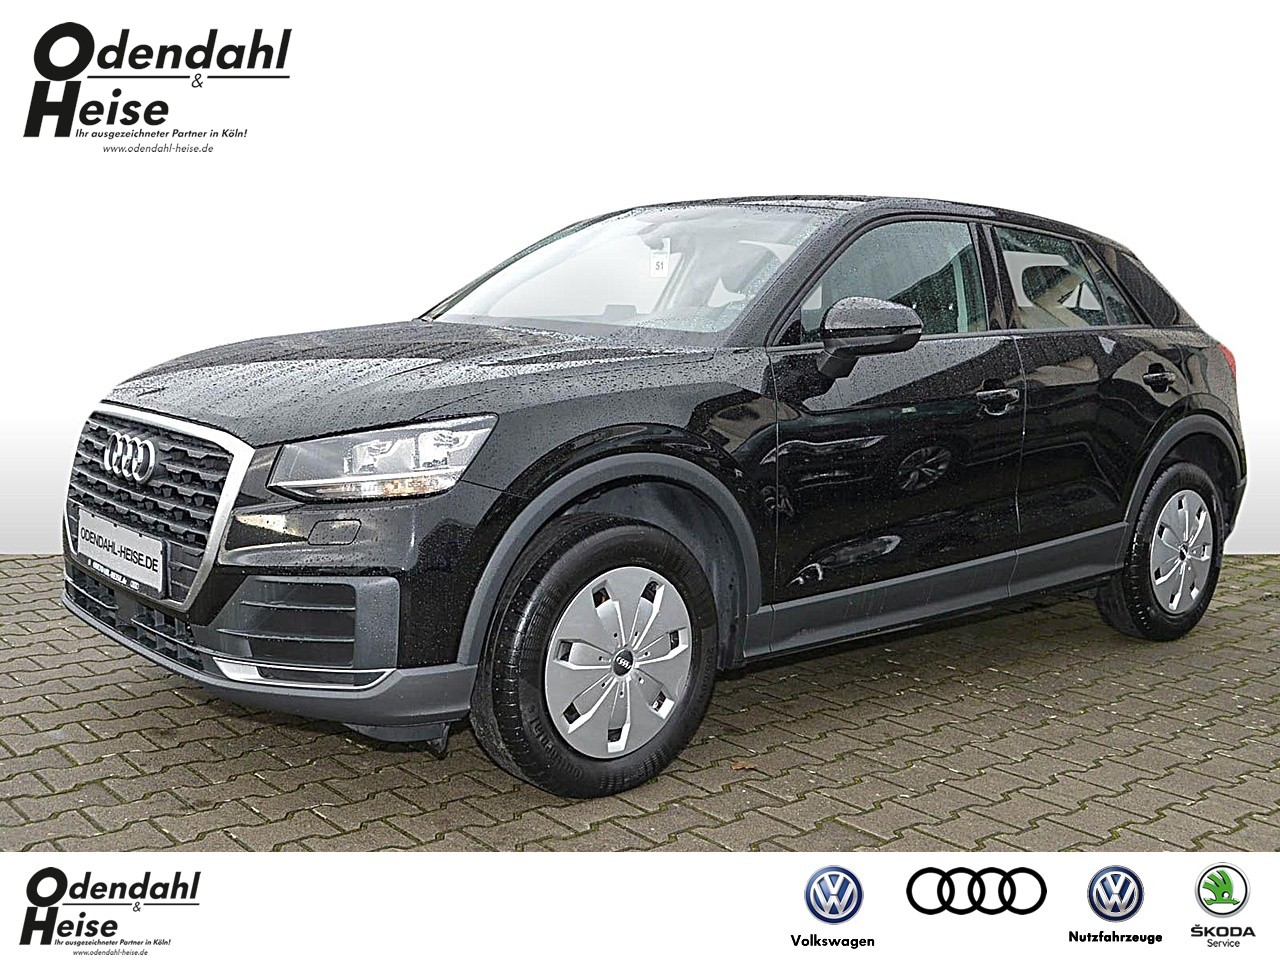 Audi Q2 1.6 TDI S-Tronic EU6 Klima Navi Einparkhilfe, Jahr 2017, Diesel